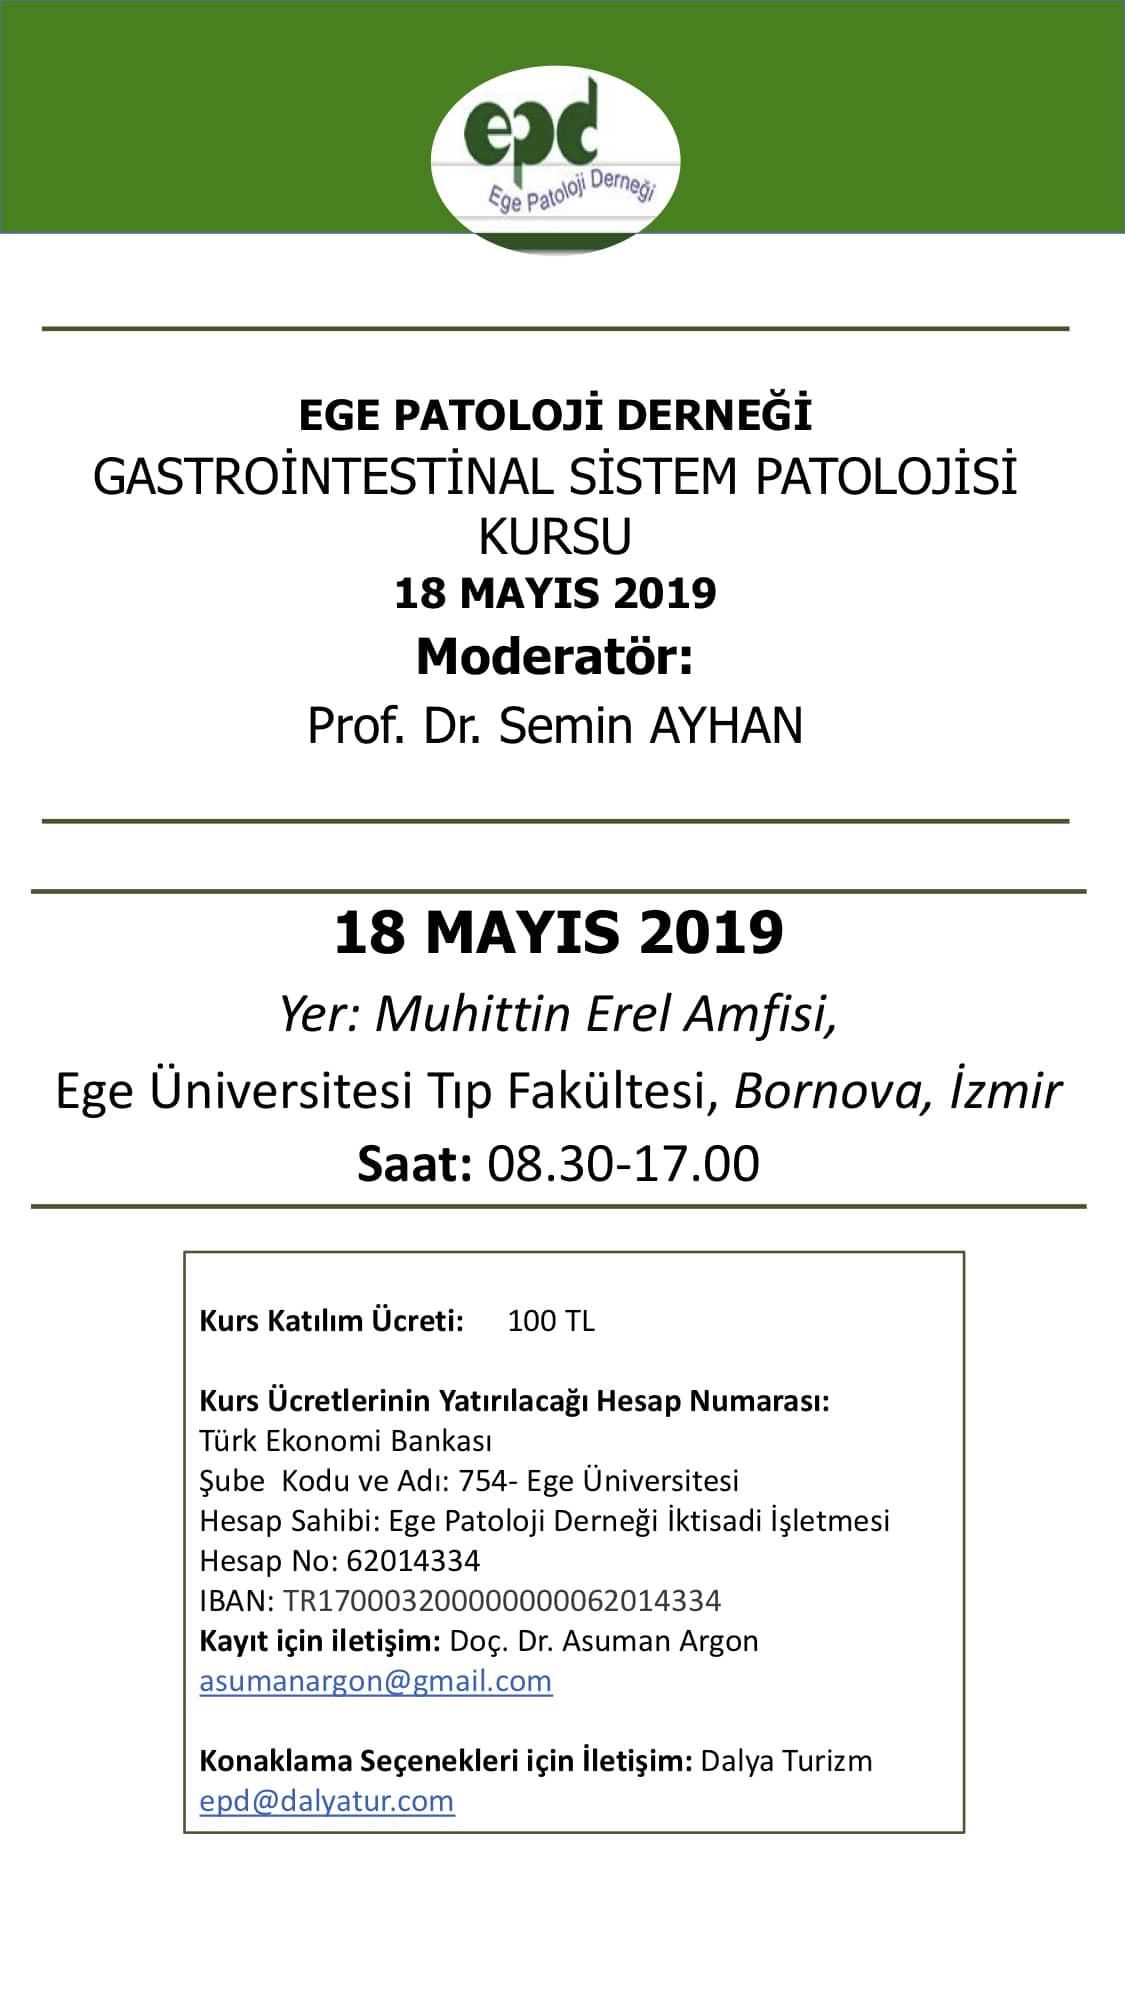 Gastrointestinal Sistem Kursu 18  MAYIS 2019 duyuru3